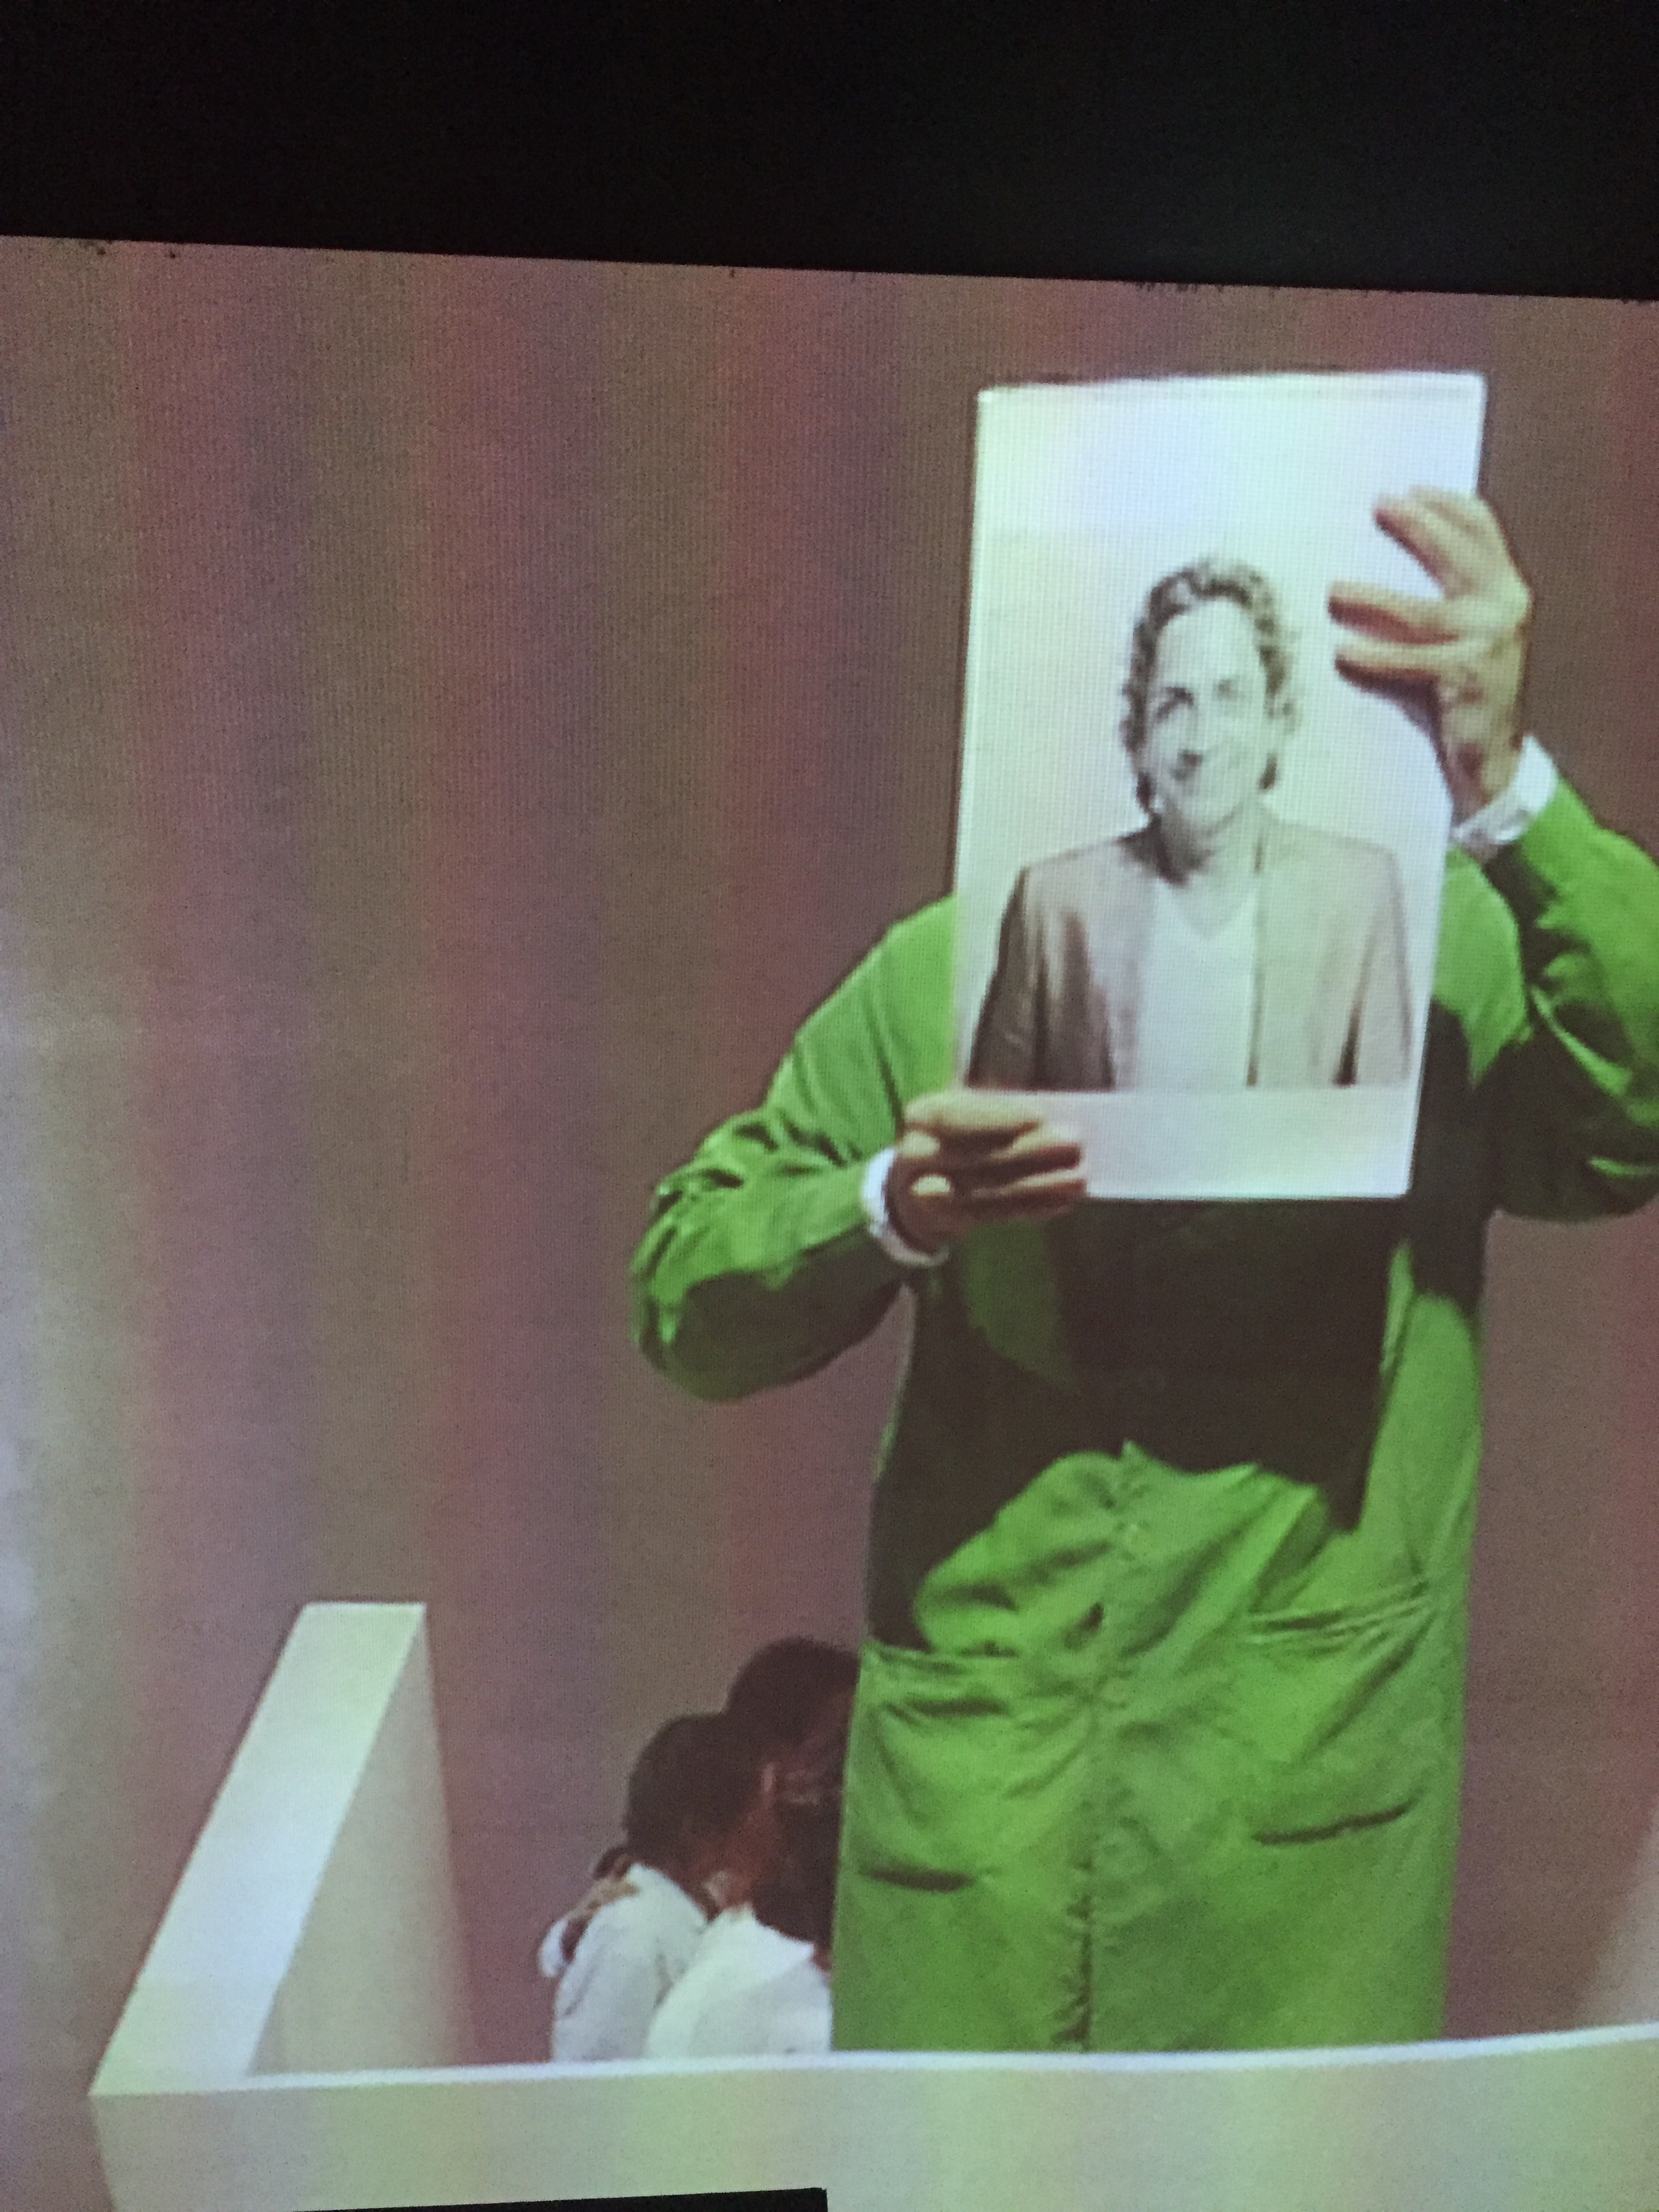 Bani/Weng, carrying an image of Haresh Sharma.